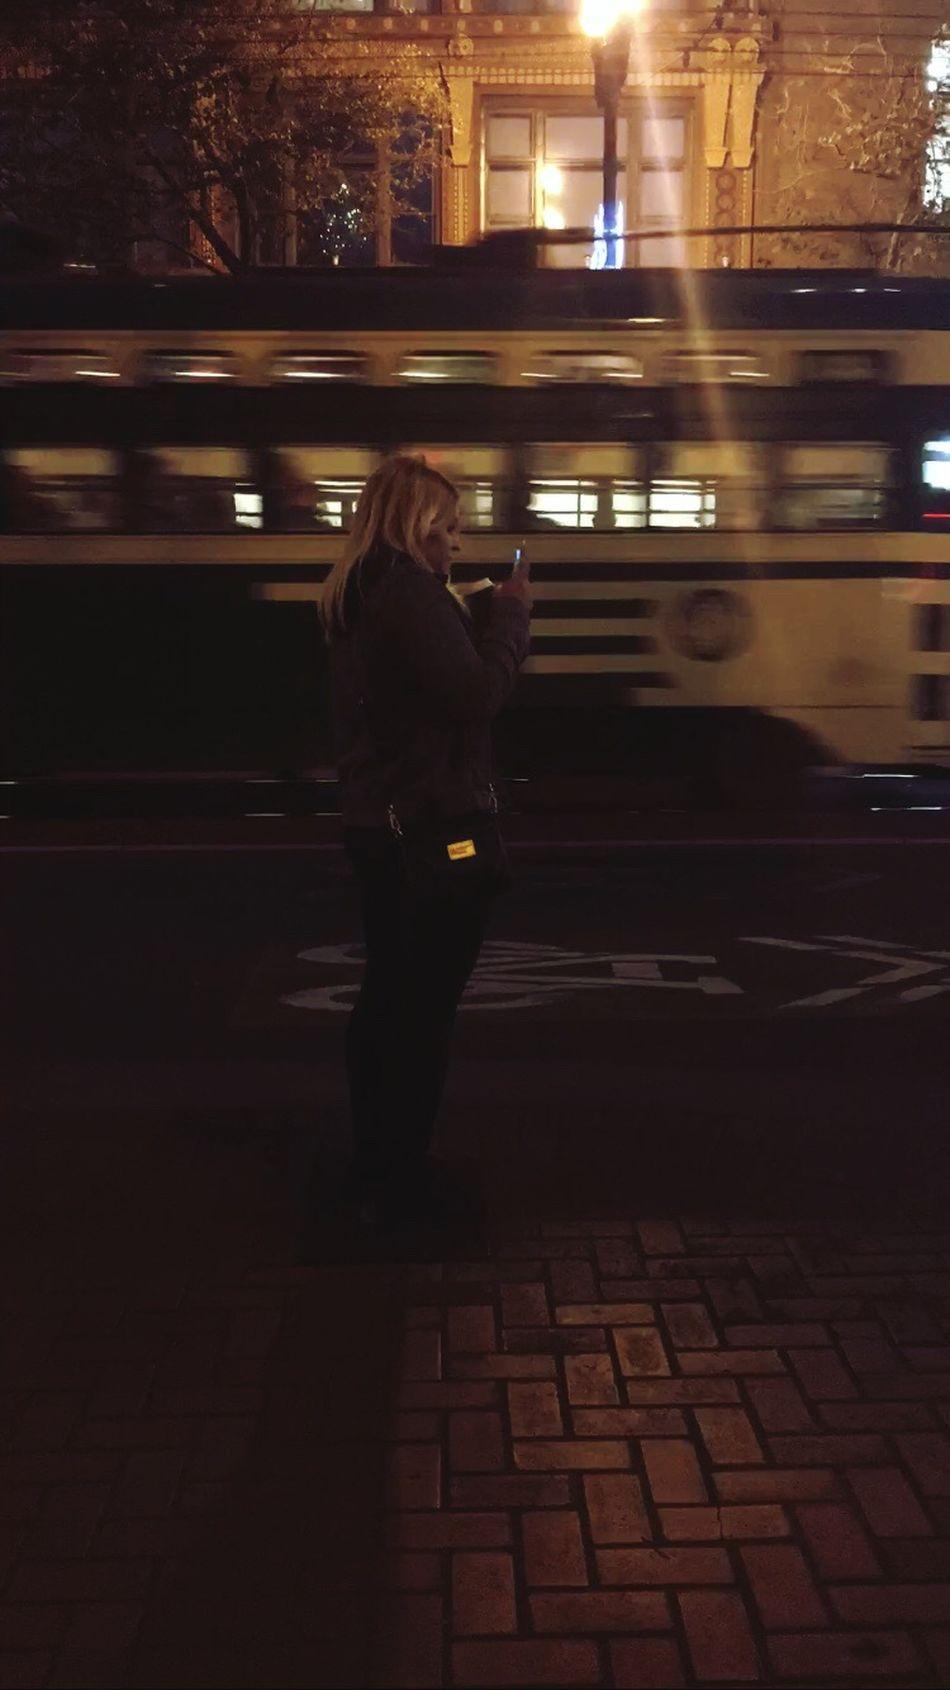 San Francisco Nightbus Knightbus Warfieldtheater Transportation One Person Real People Waiting Night People Citylife